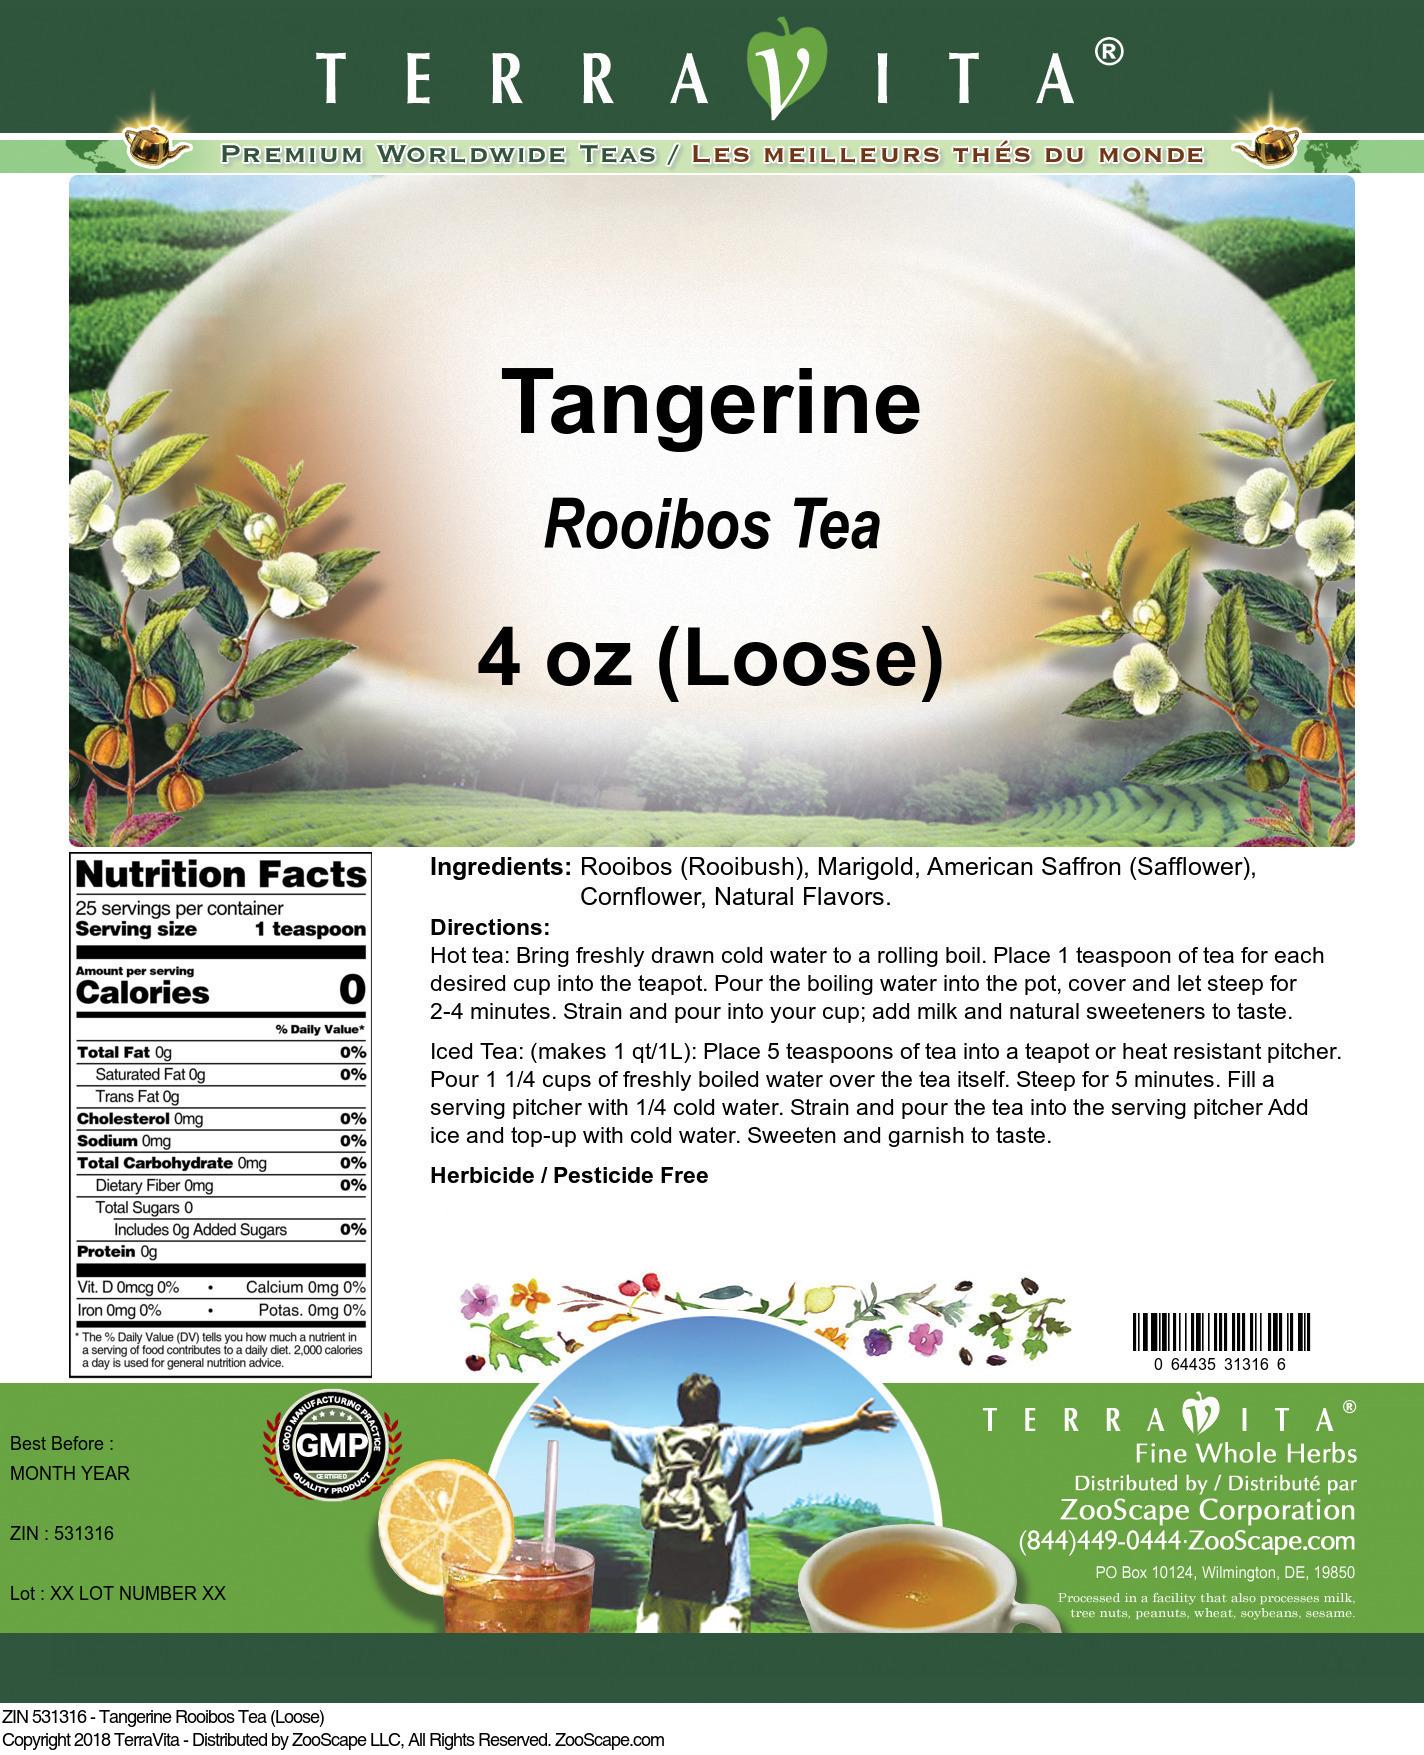 Tangerine Rooibos Tea